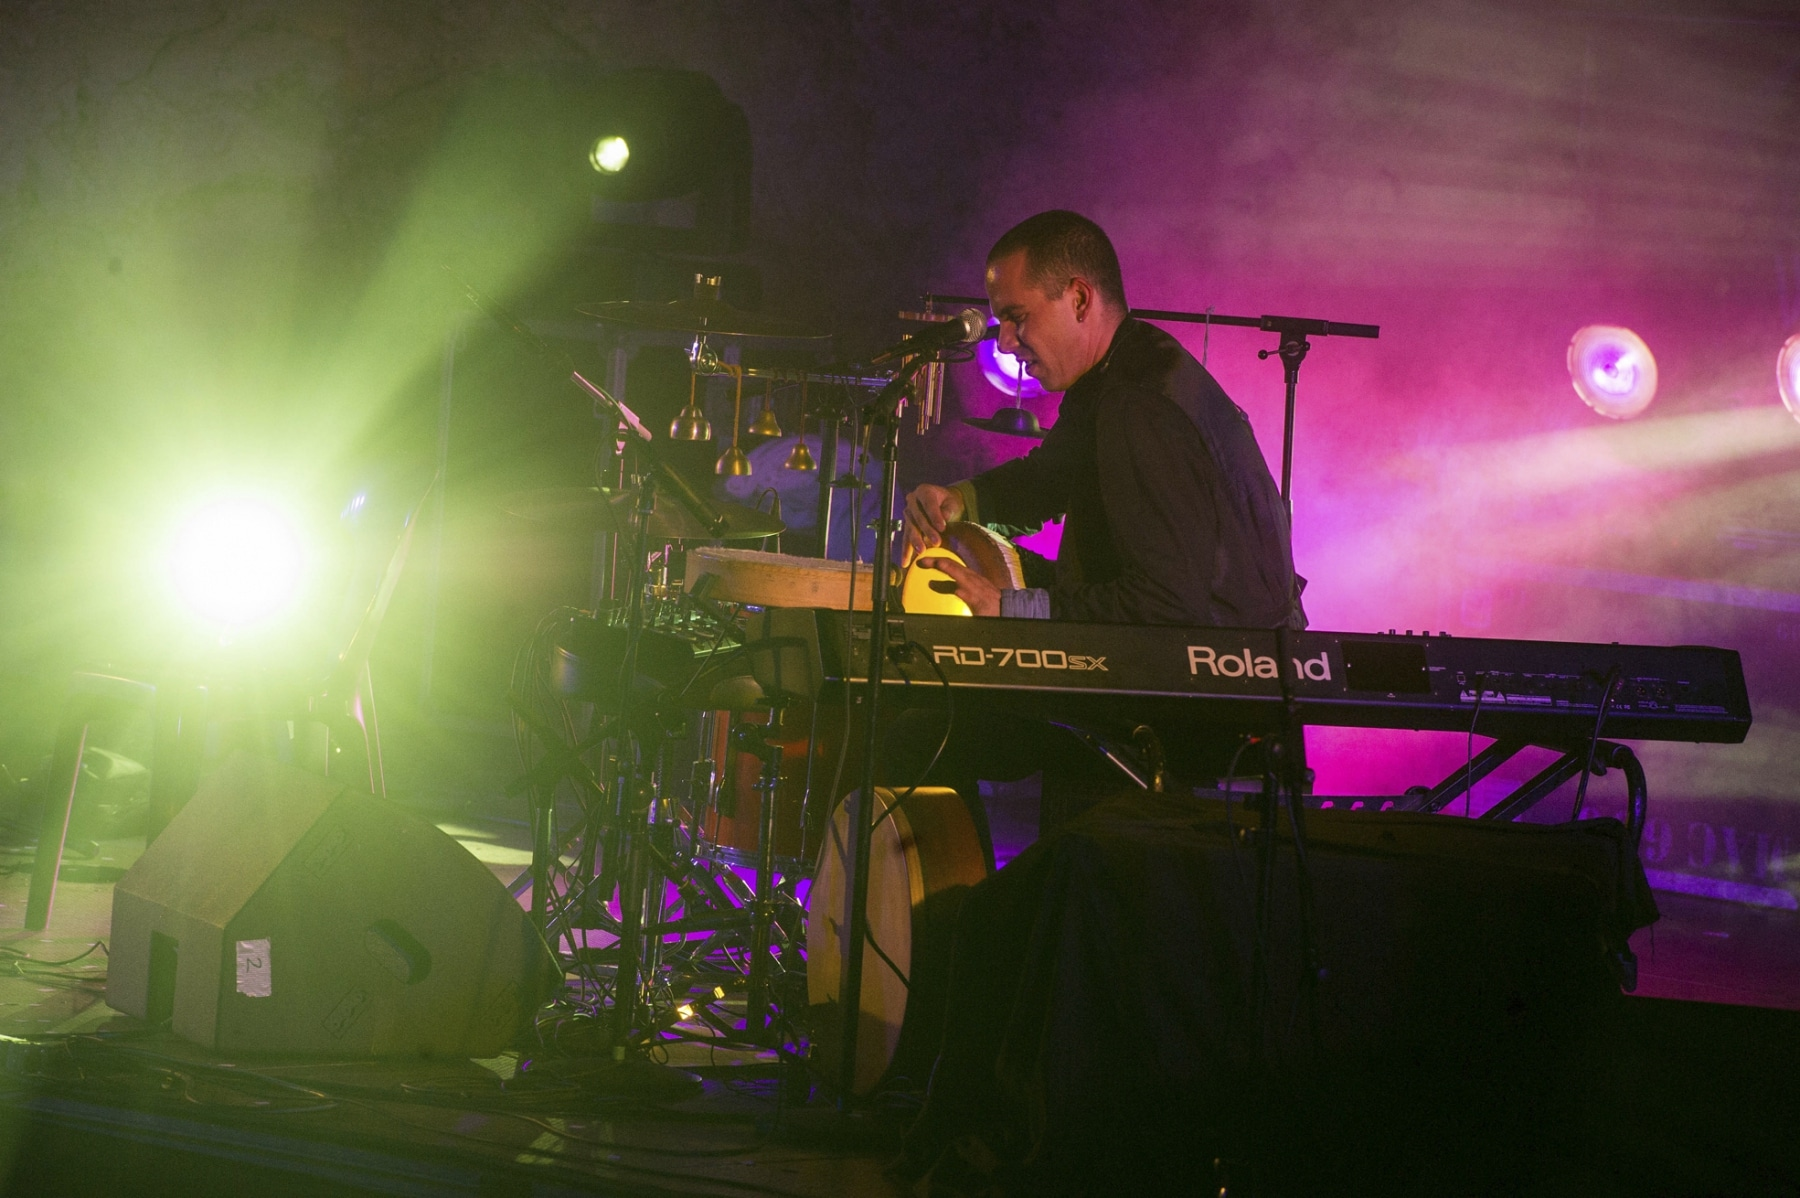 19-mayo-gibraltar-world-music-festival25_14484559123_o